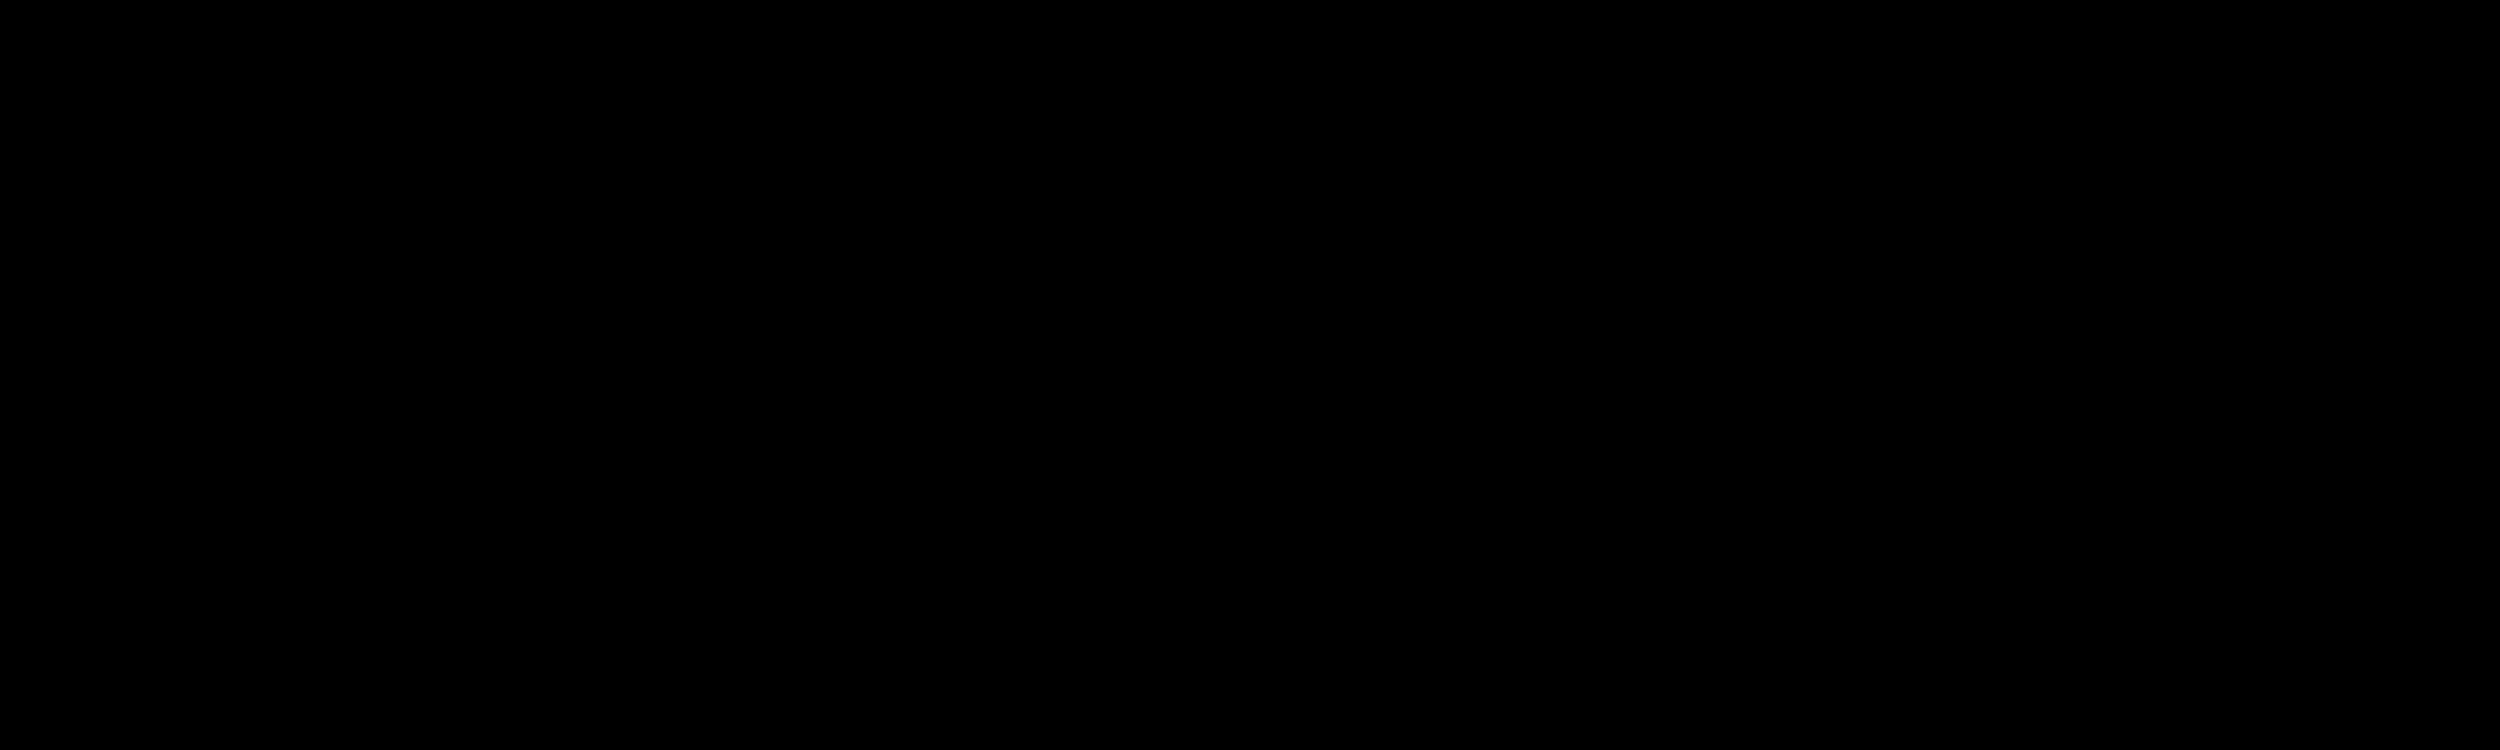 long logo-01.png